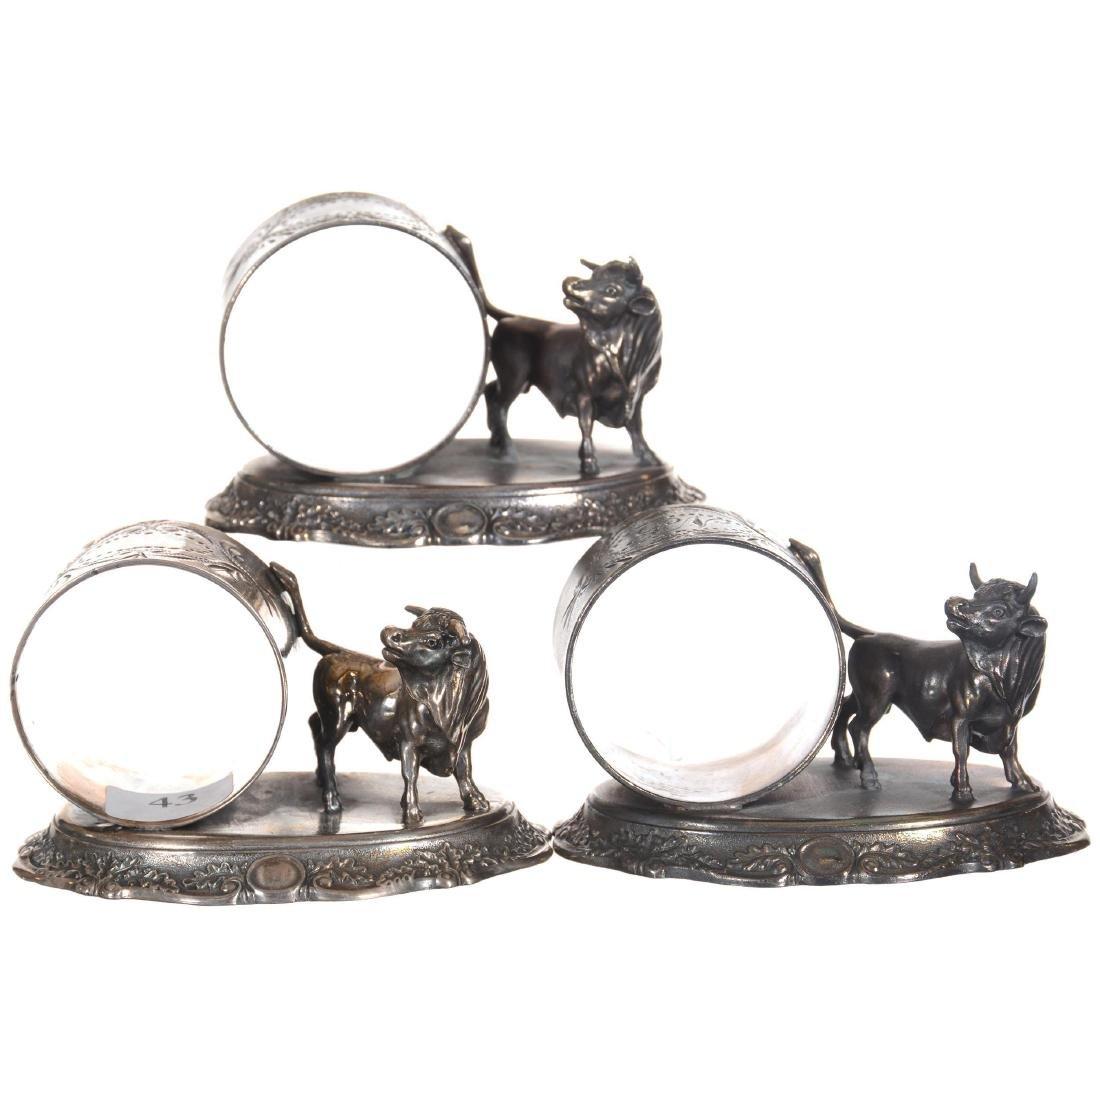 Three Silver-plate Napkin Rings